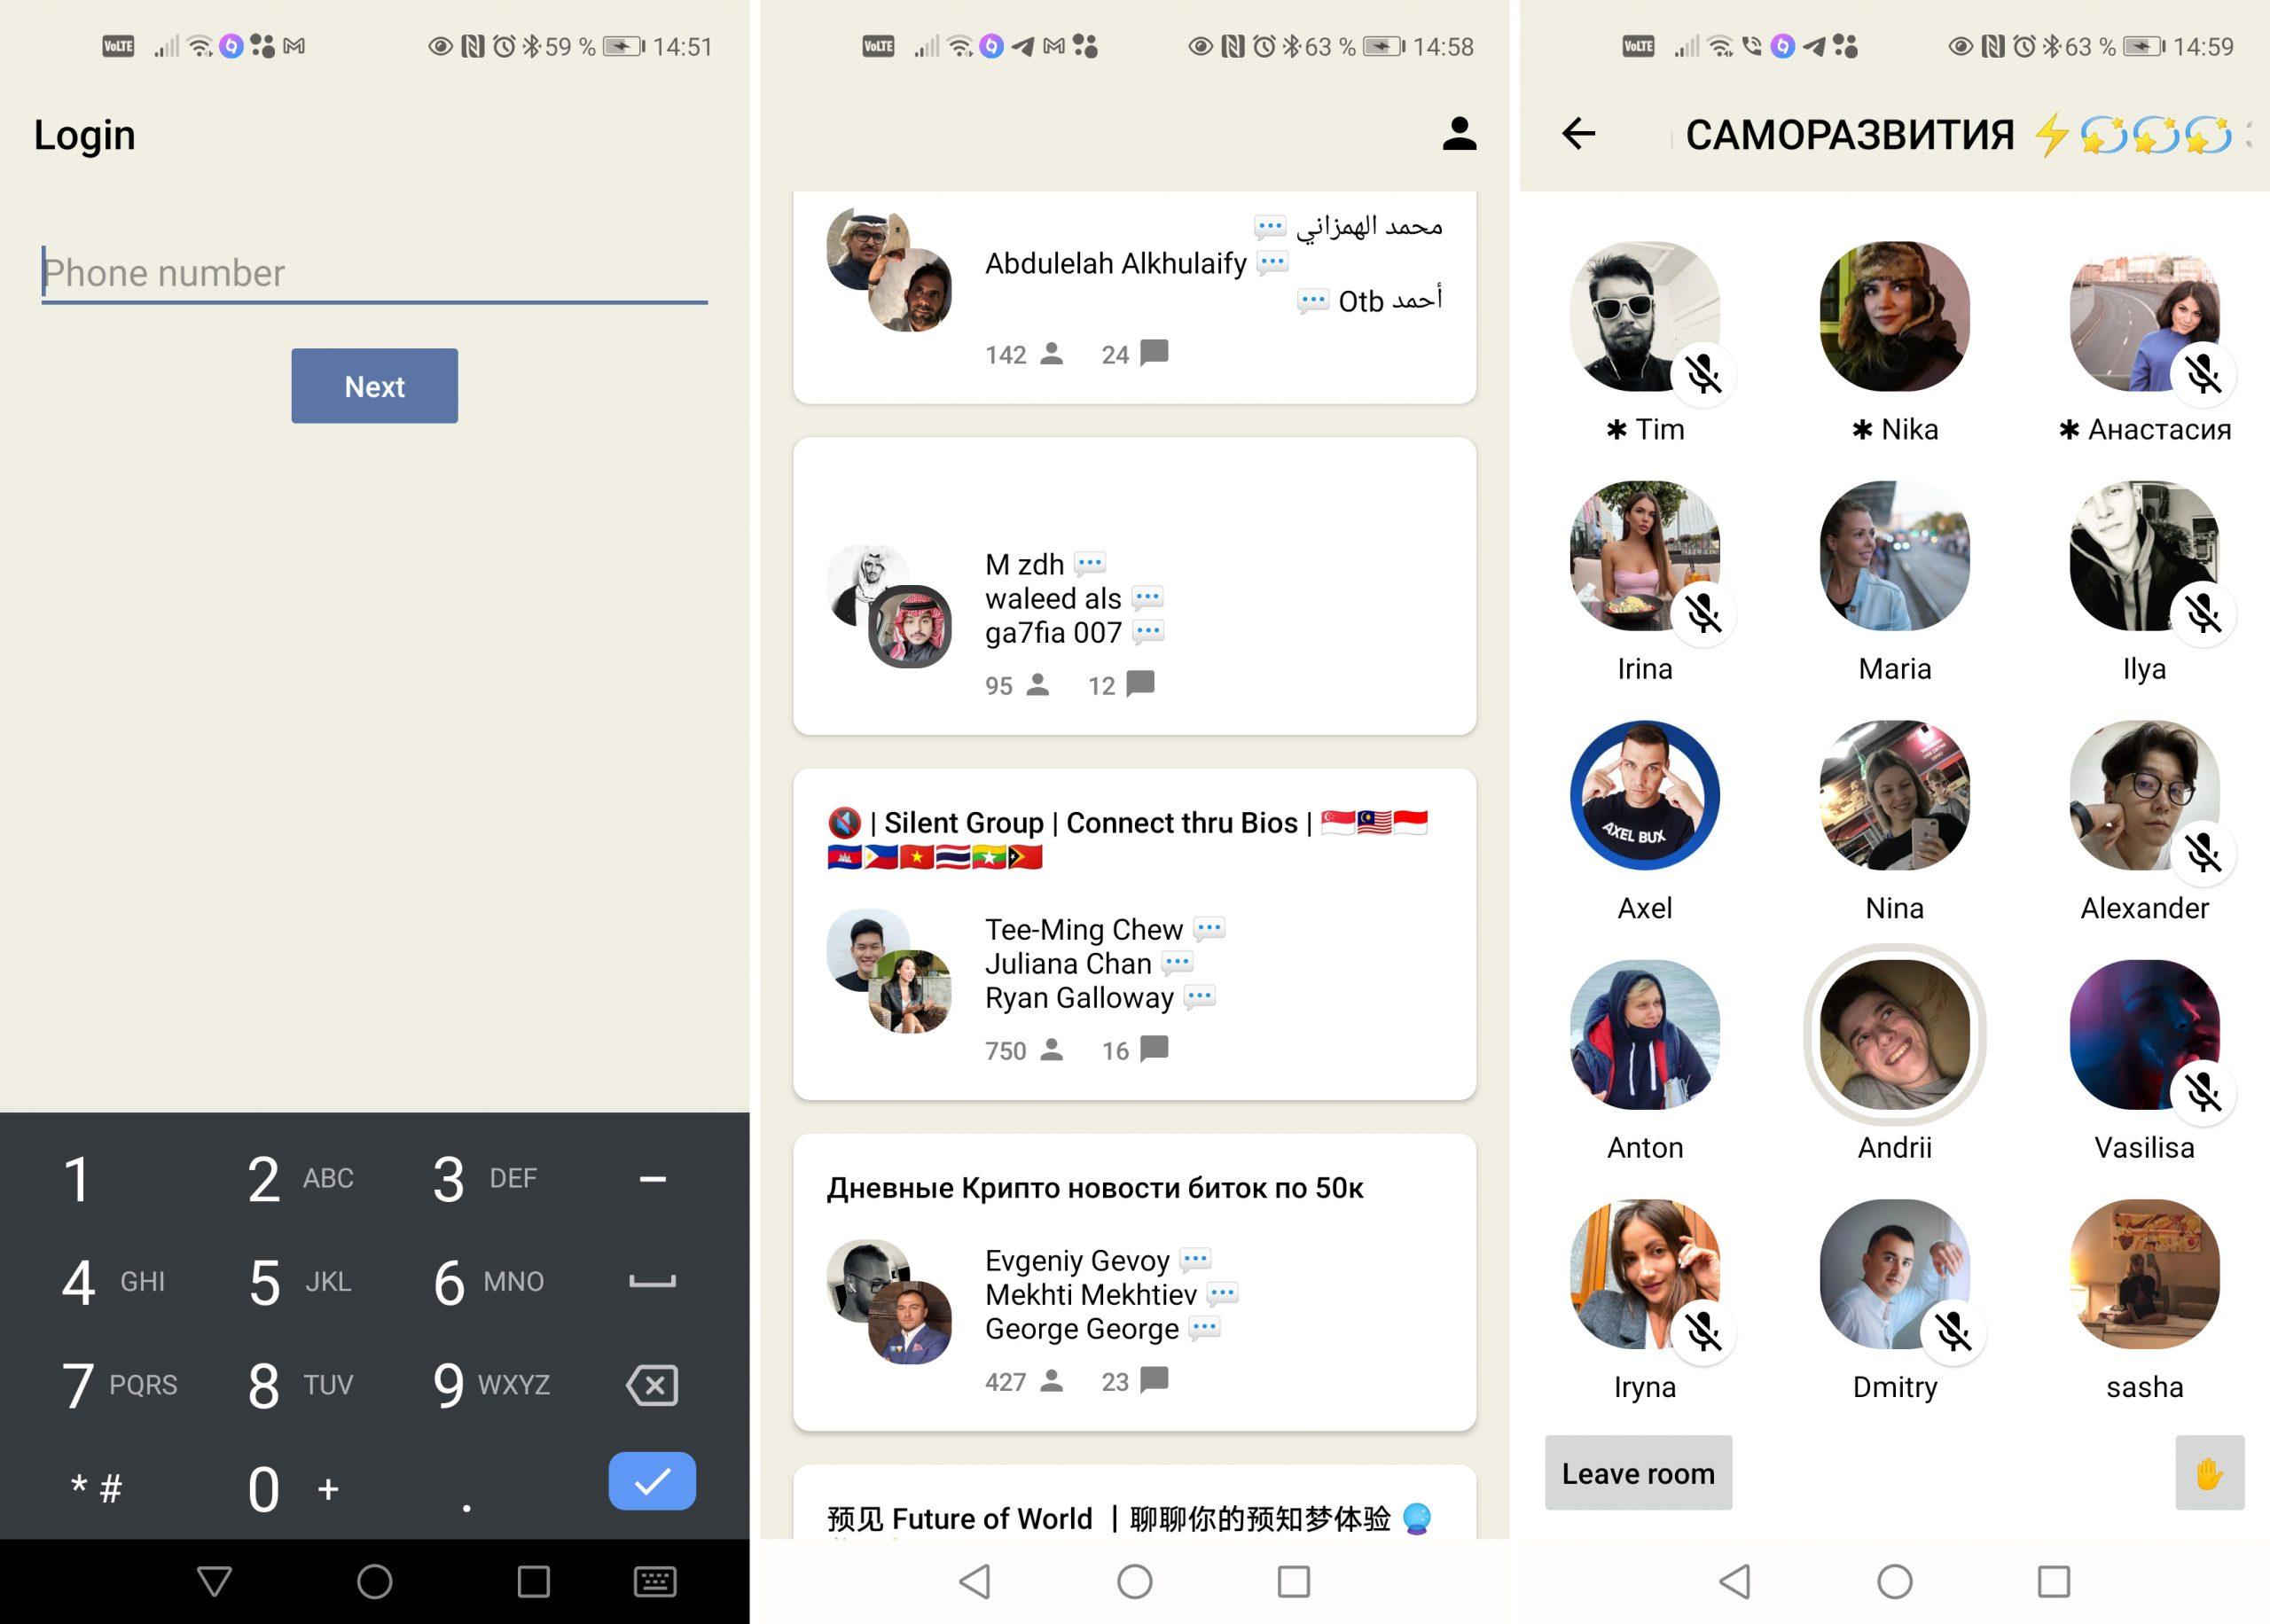 Появилась неофициальная версия Clubhouse для Android